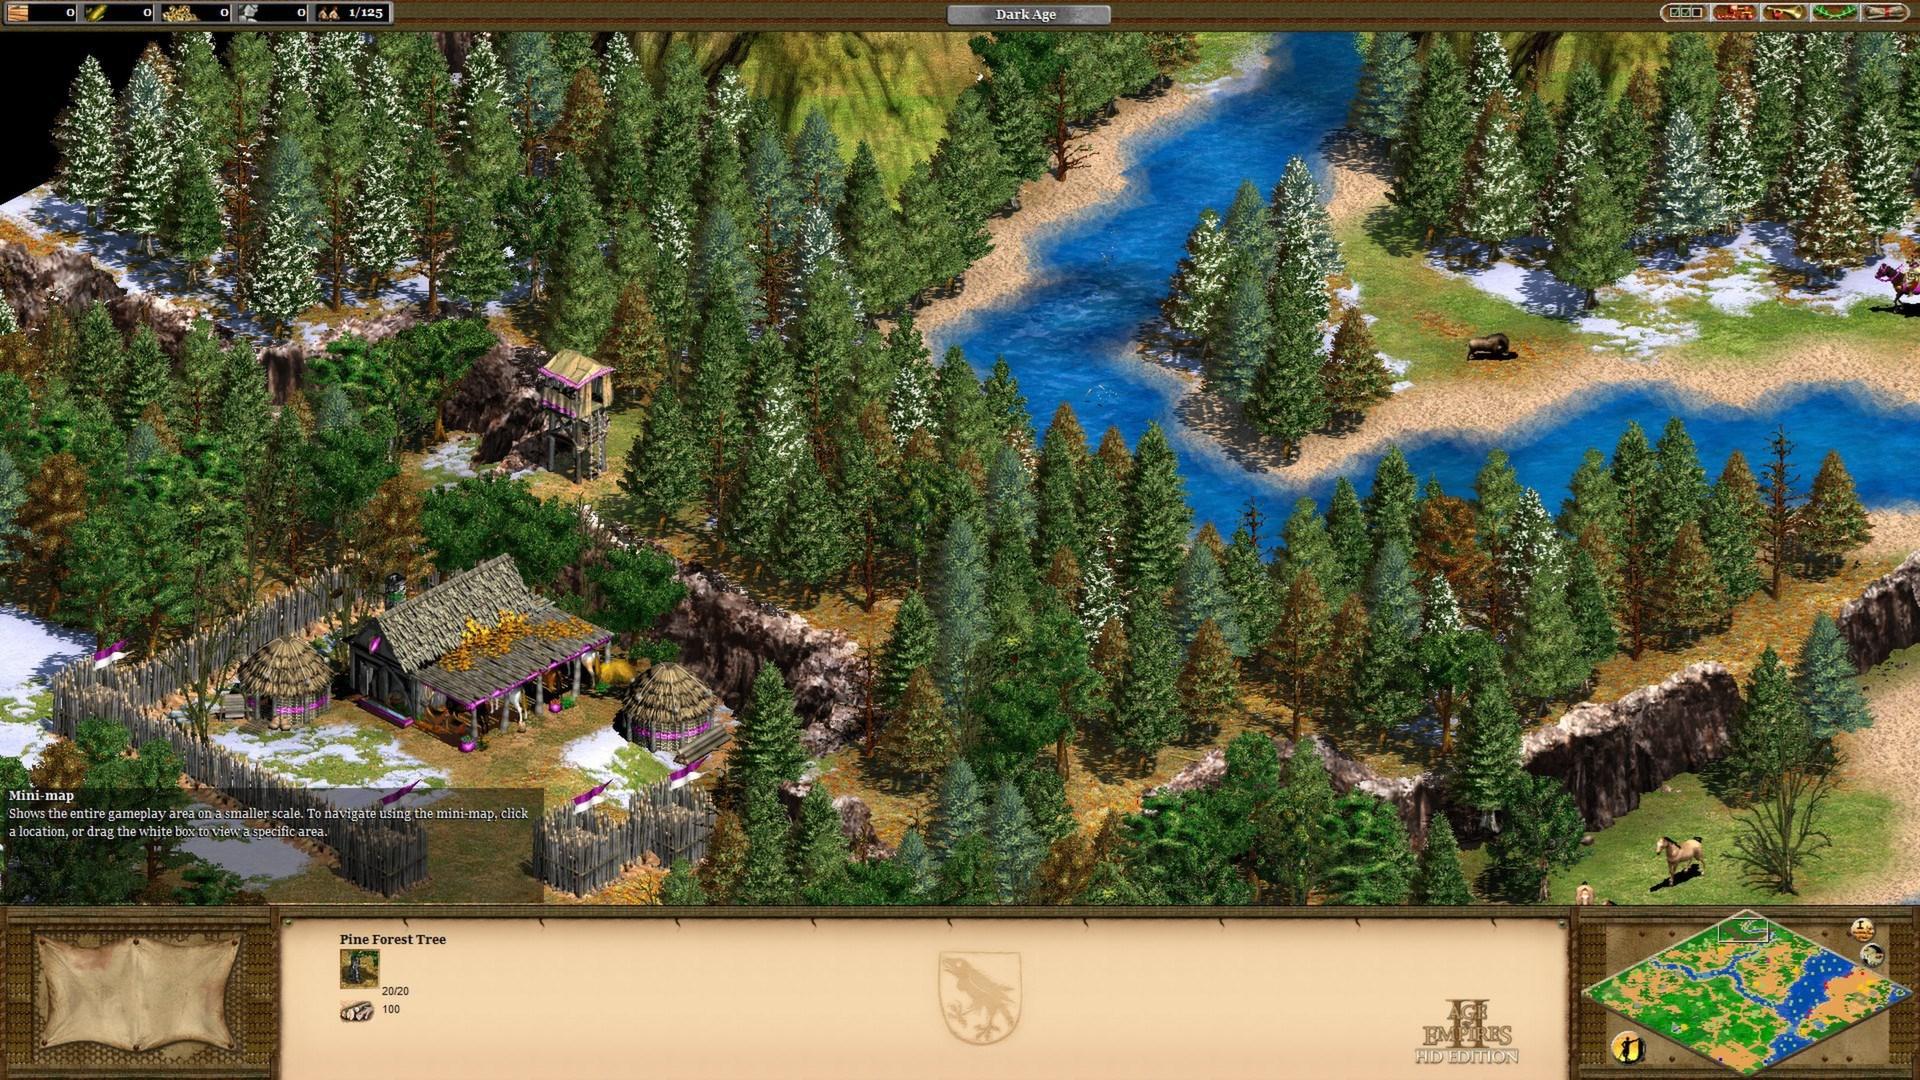 Age of Empires II HD Screenshot 5